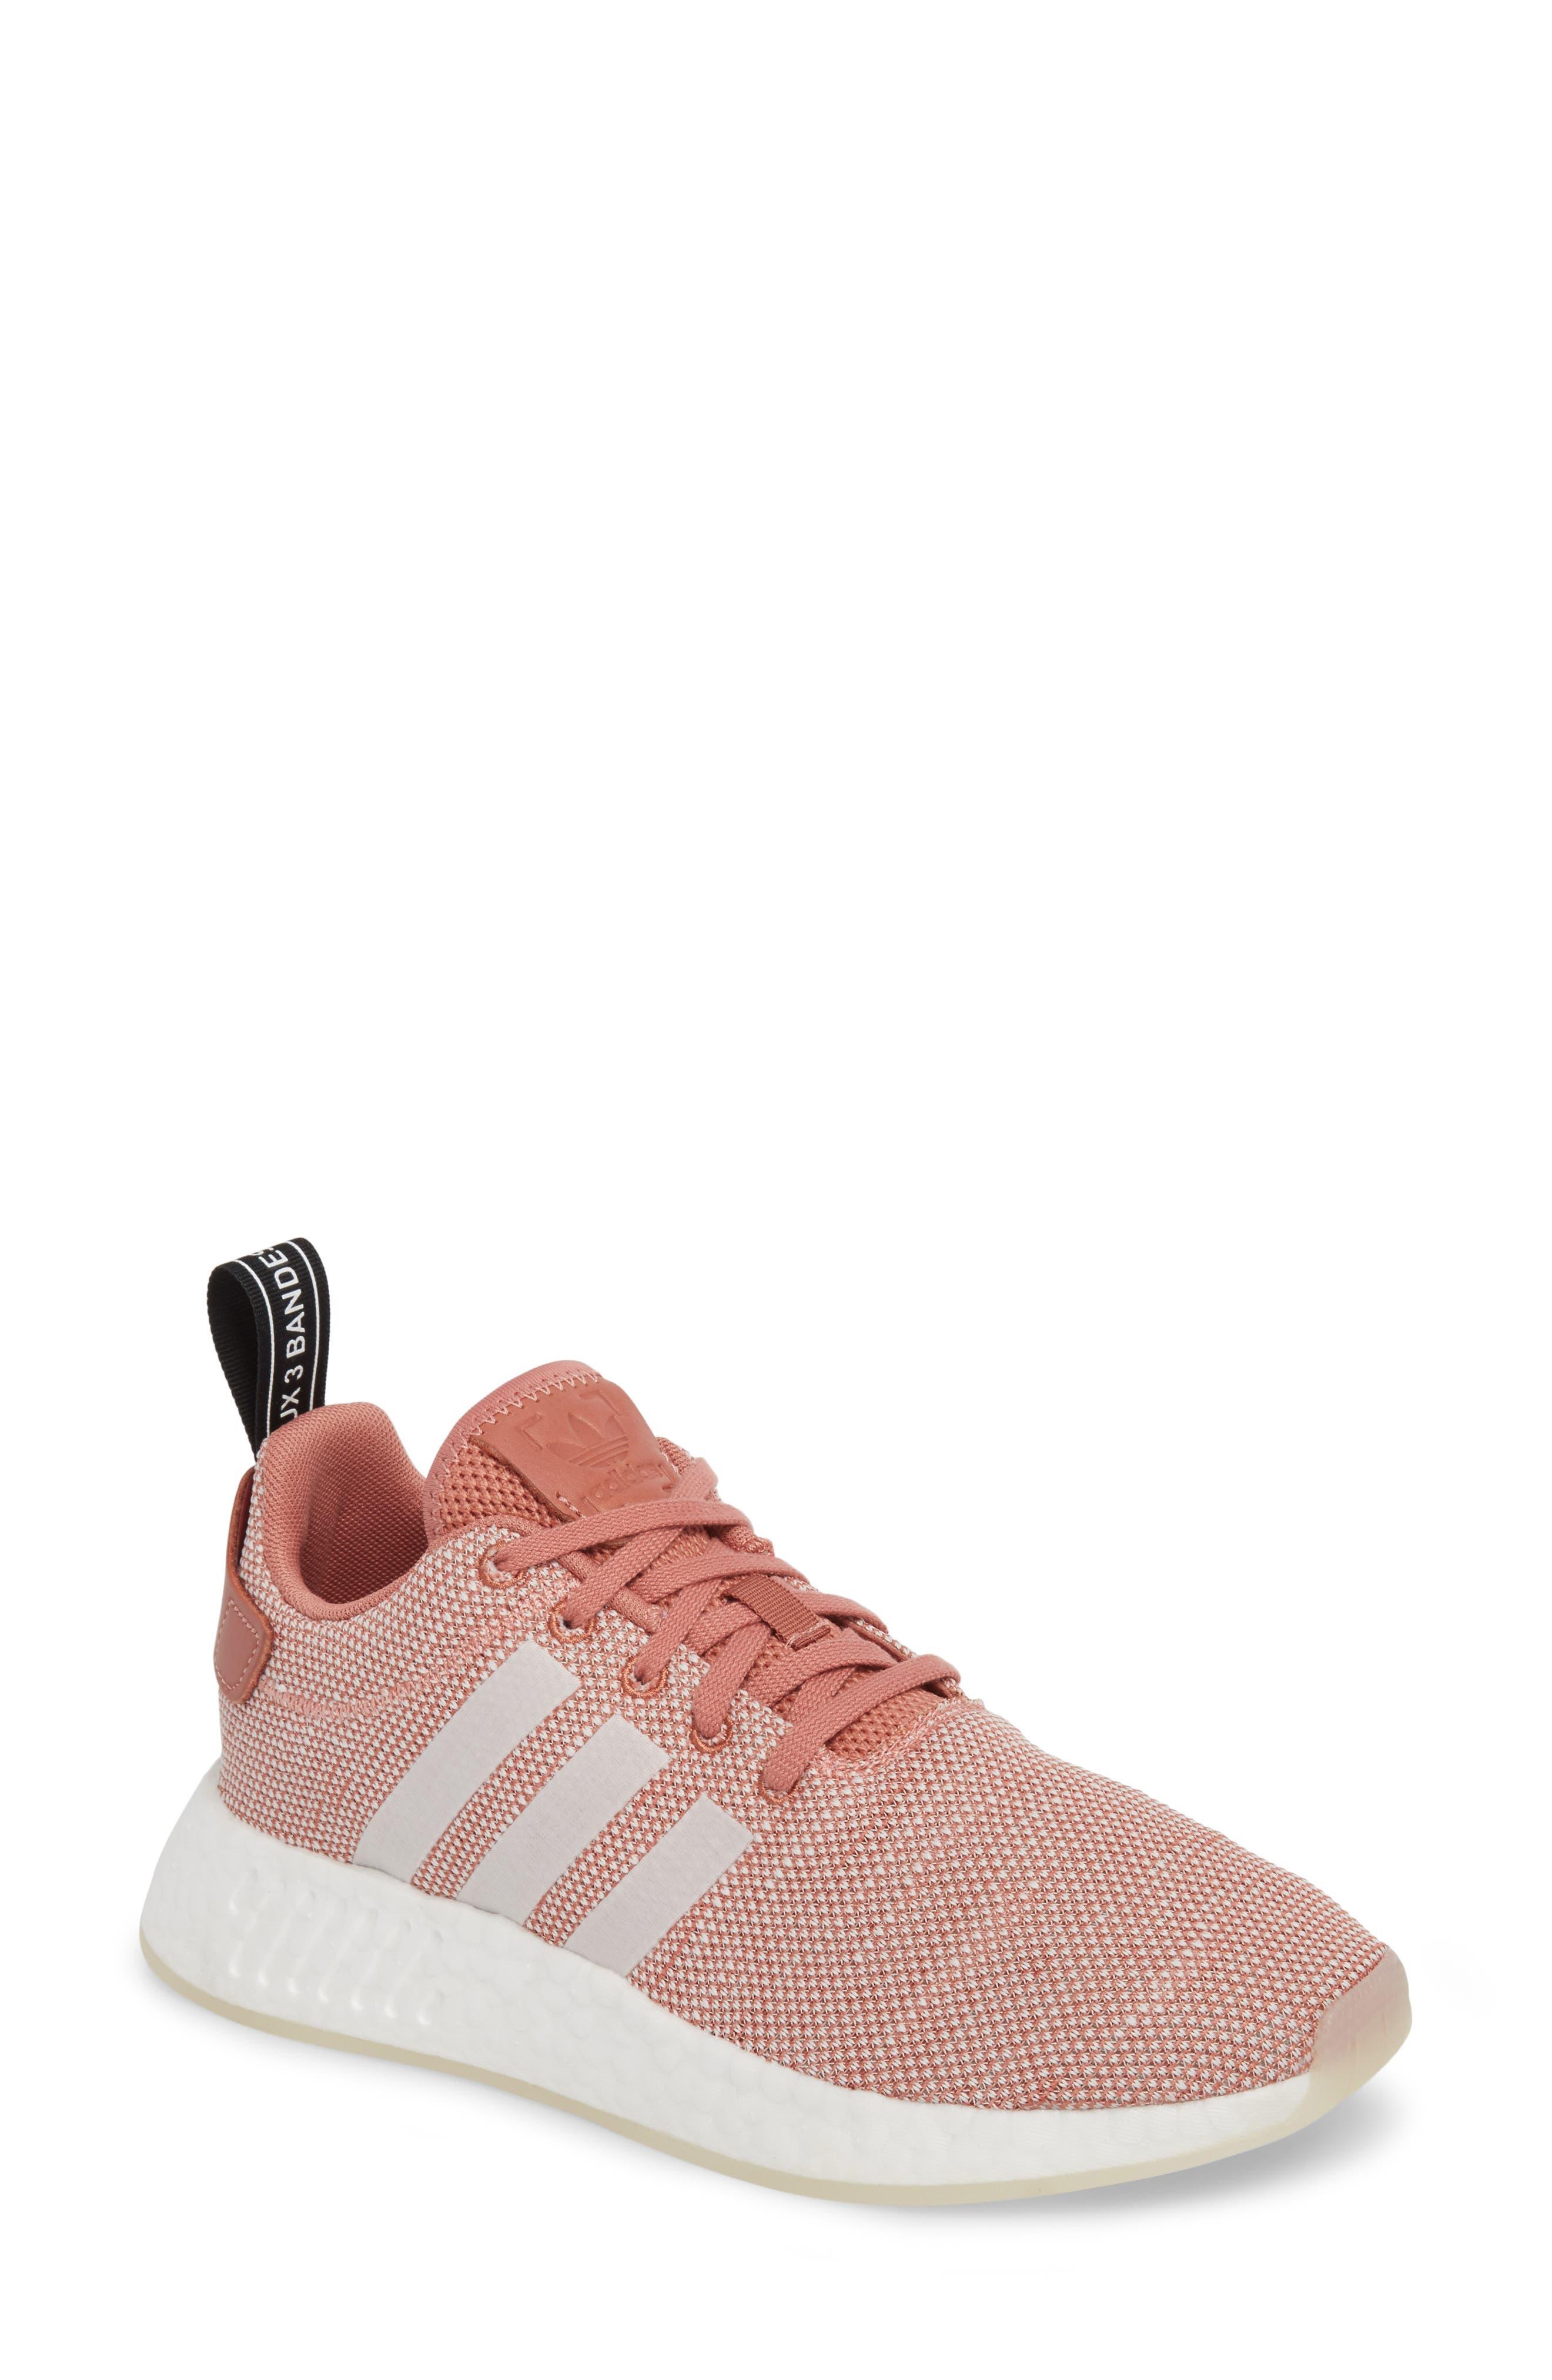 adidas NMD R2 Sneaker (Women)